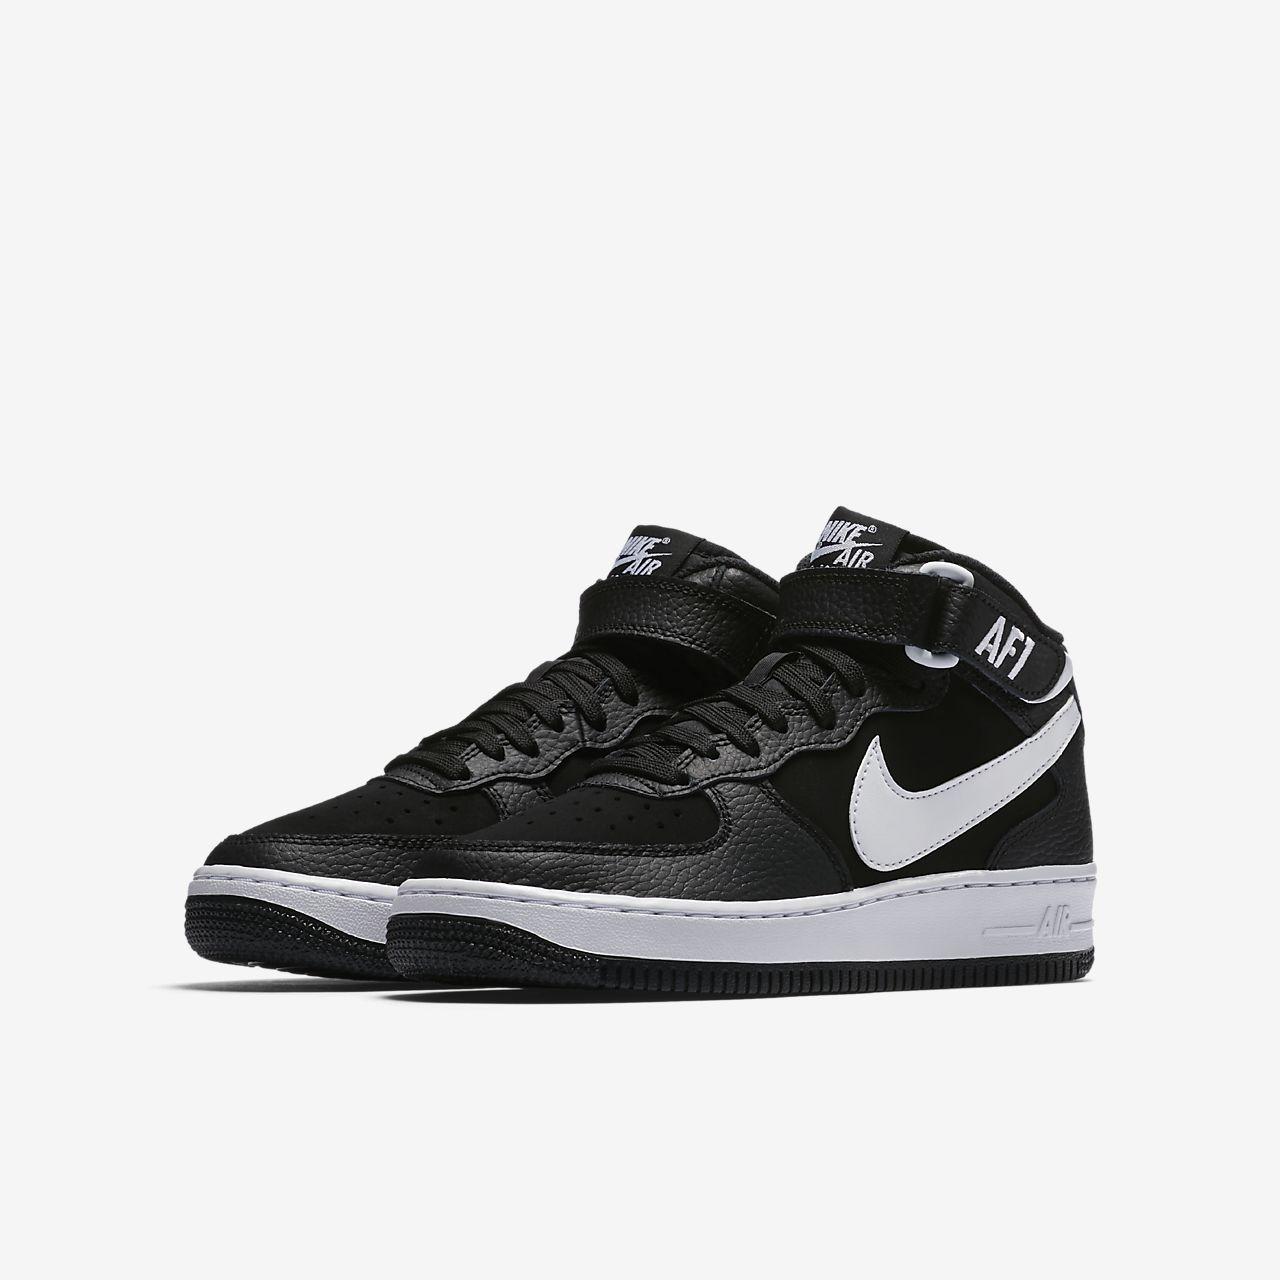 ... Nike Air Force 1 Mid 06 Older Kids' Shoe